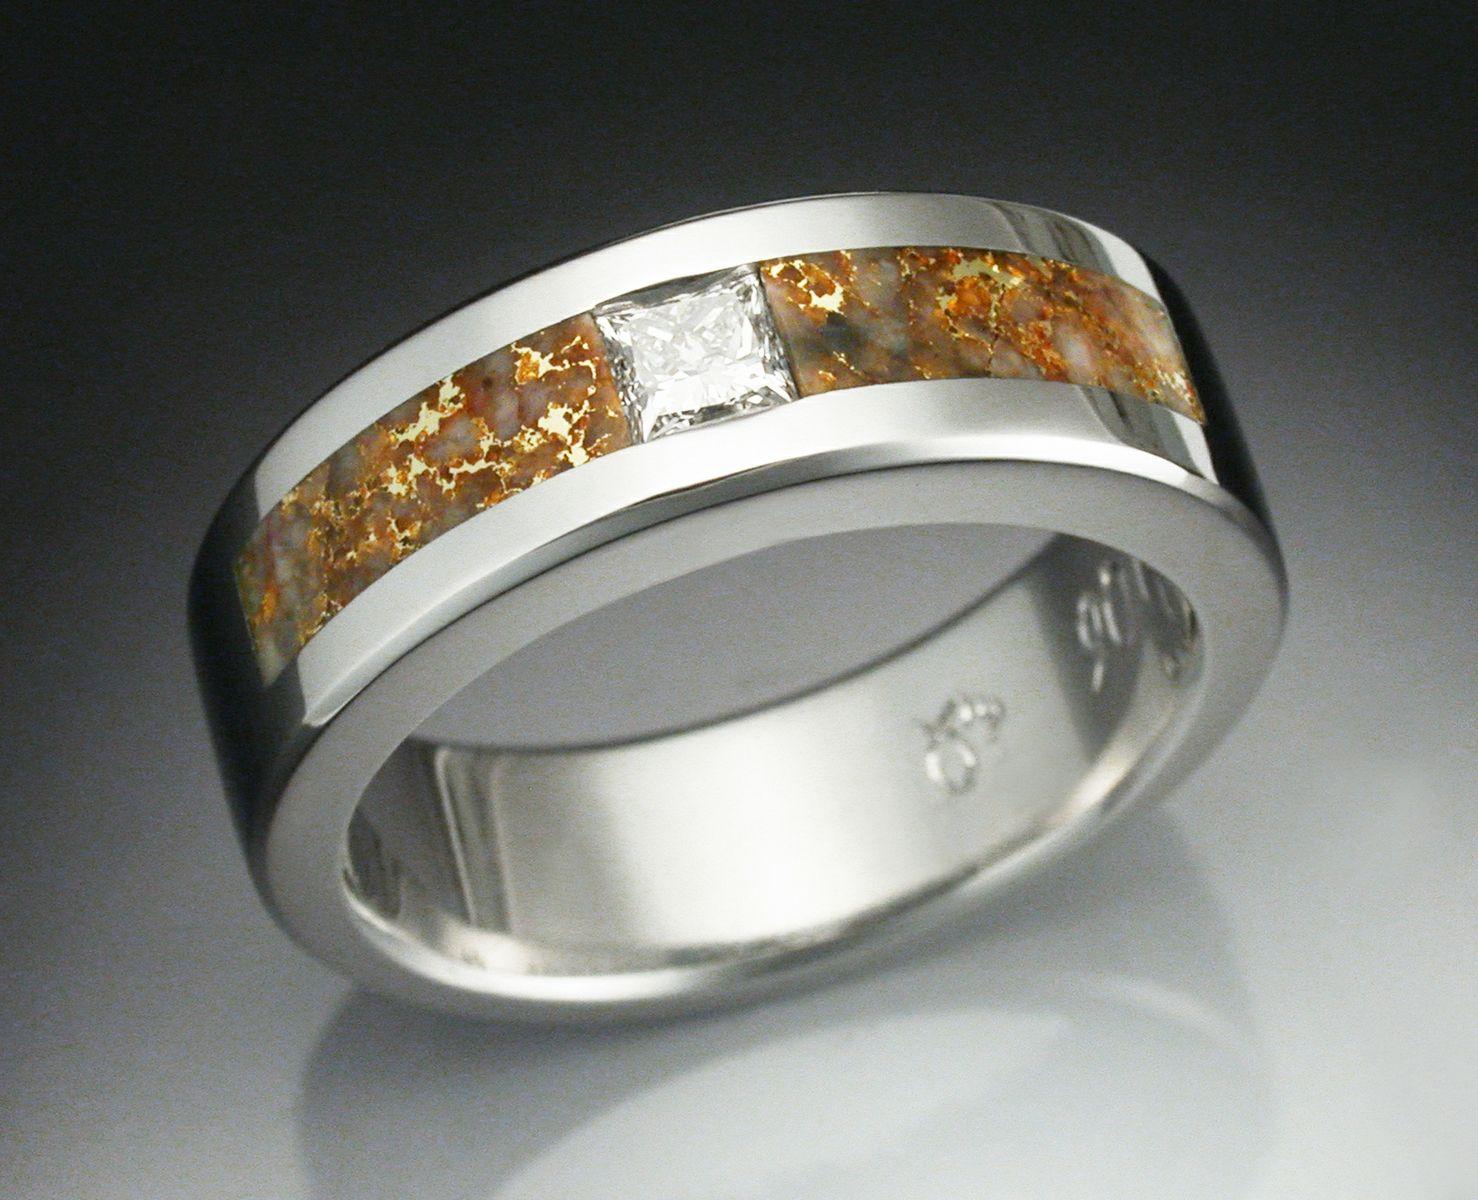 custom wedding rings men man wedding ring Custom wedding rings men Custom Made Man S Diamond Ring In Platinum Inlaid With Gold